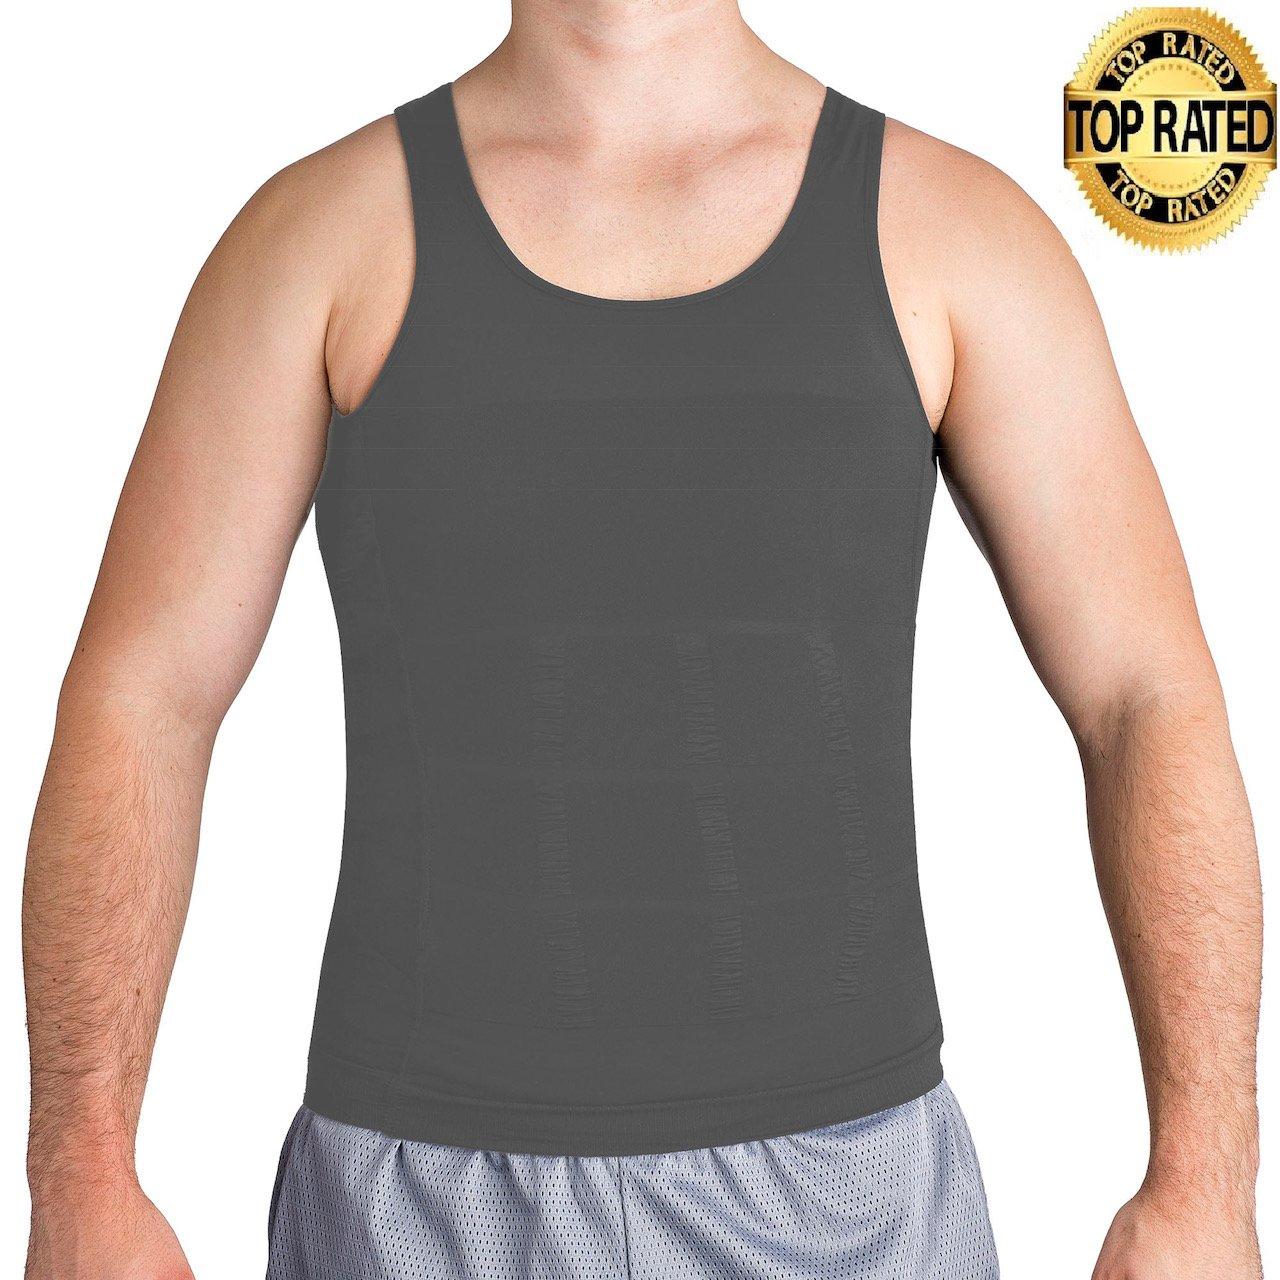 ROC Bodywear Men's Slimming Body Shaper Compression